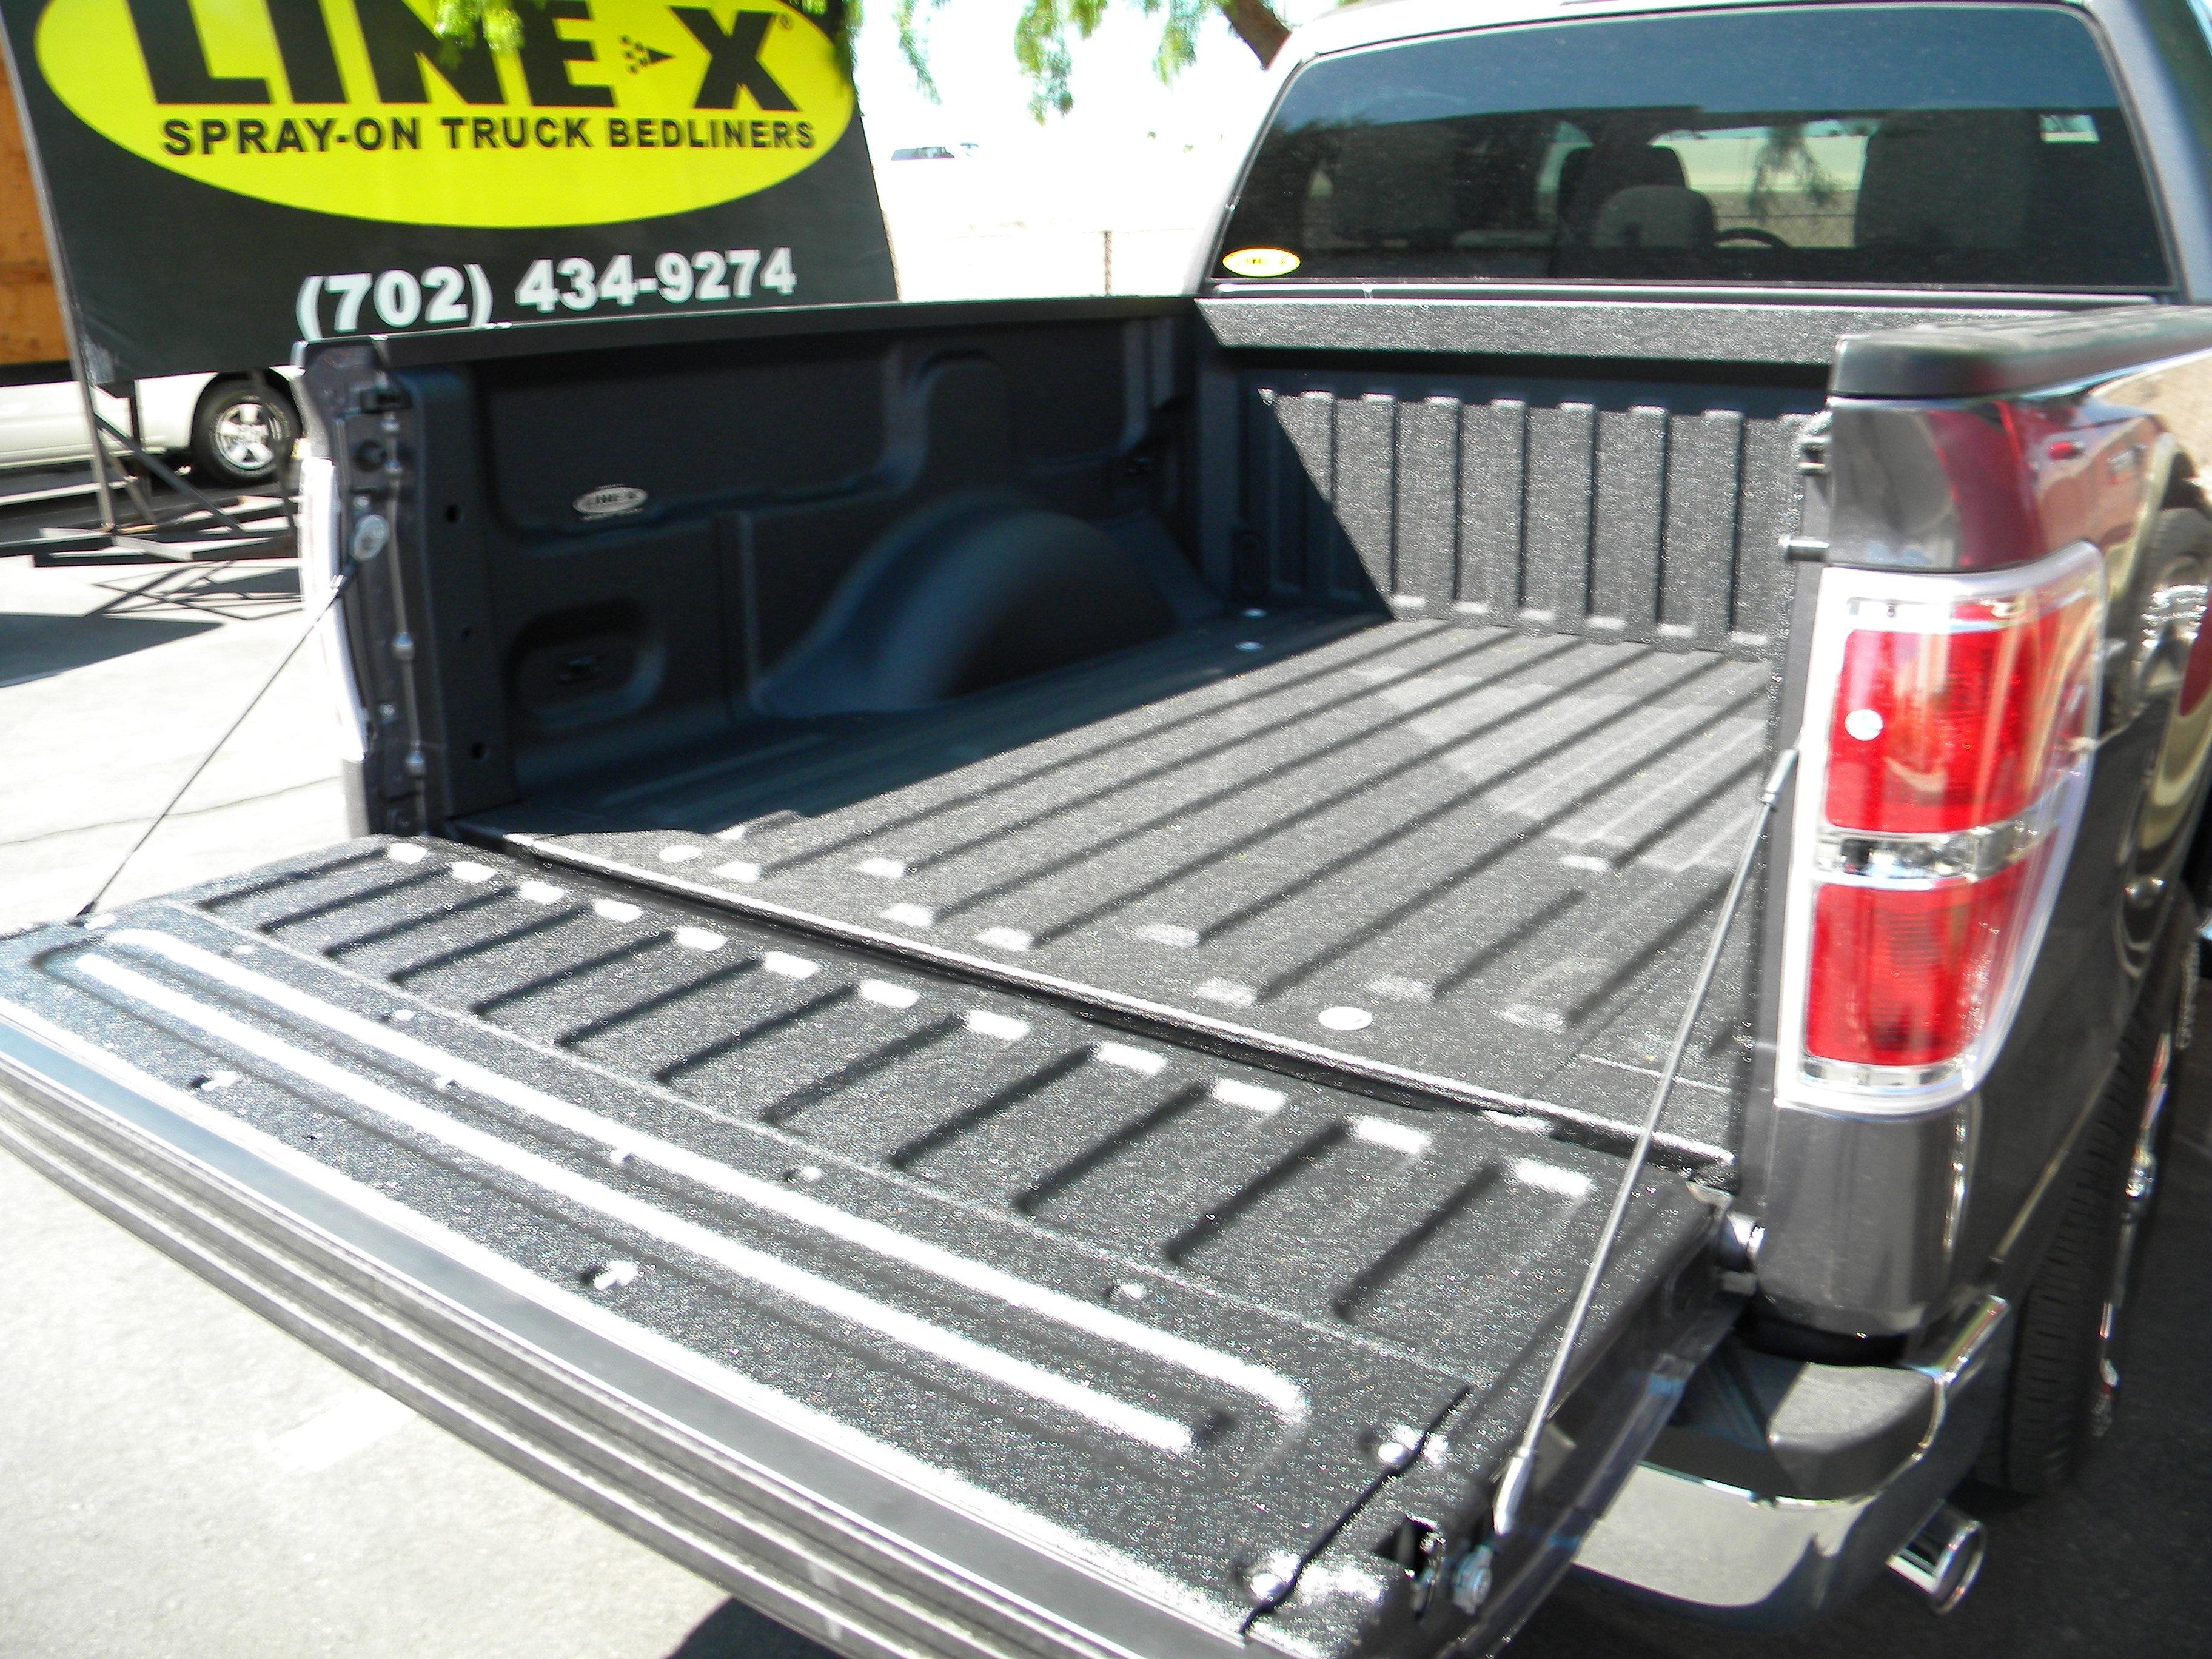 Rhino Spray Bed Liner Las Vegas